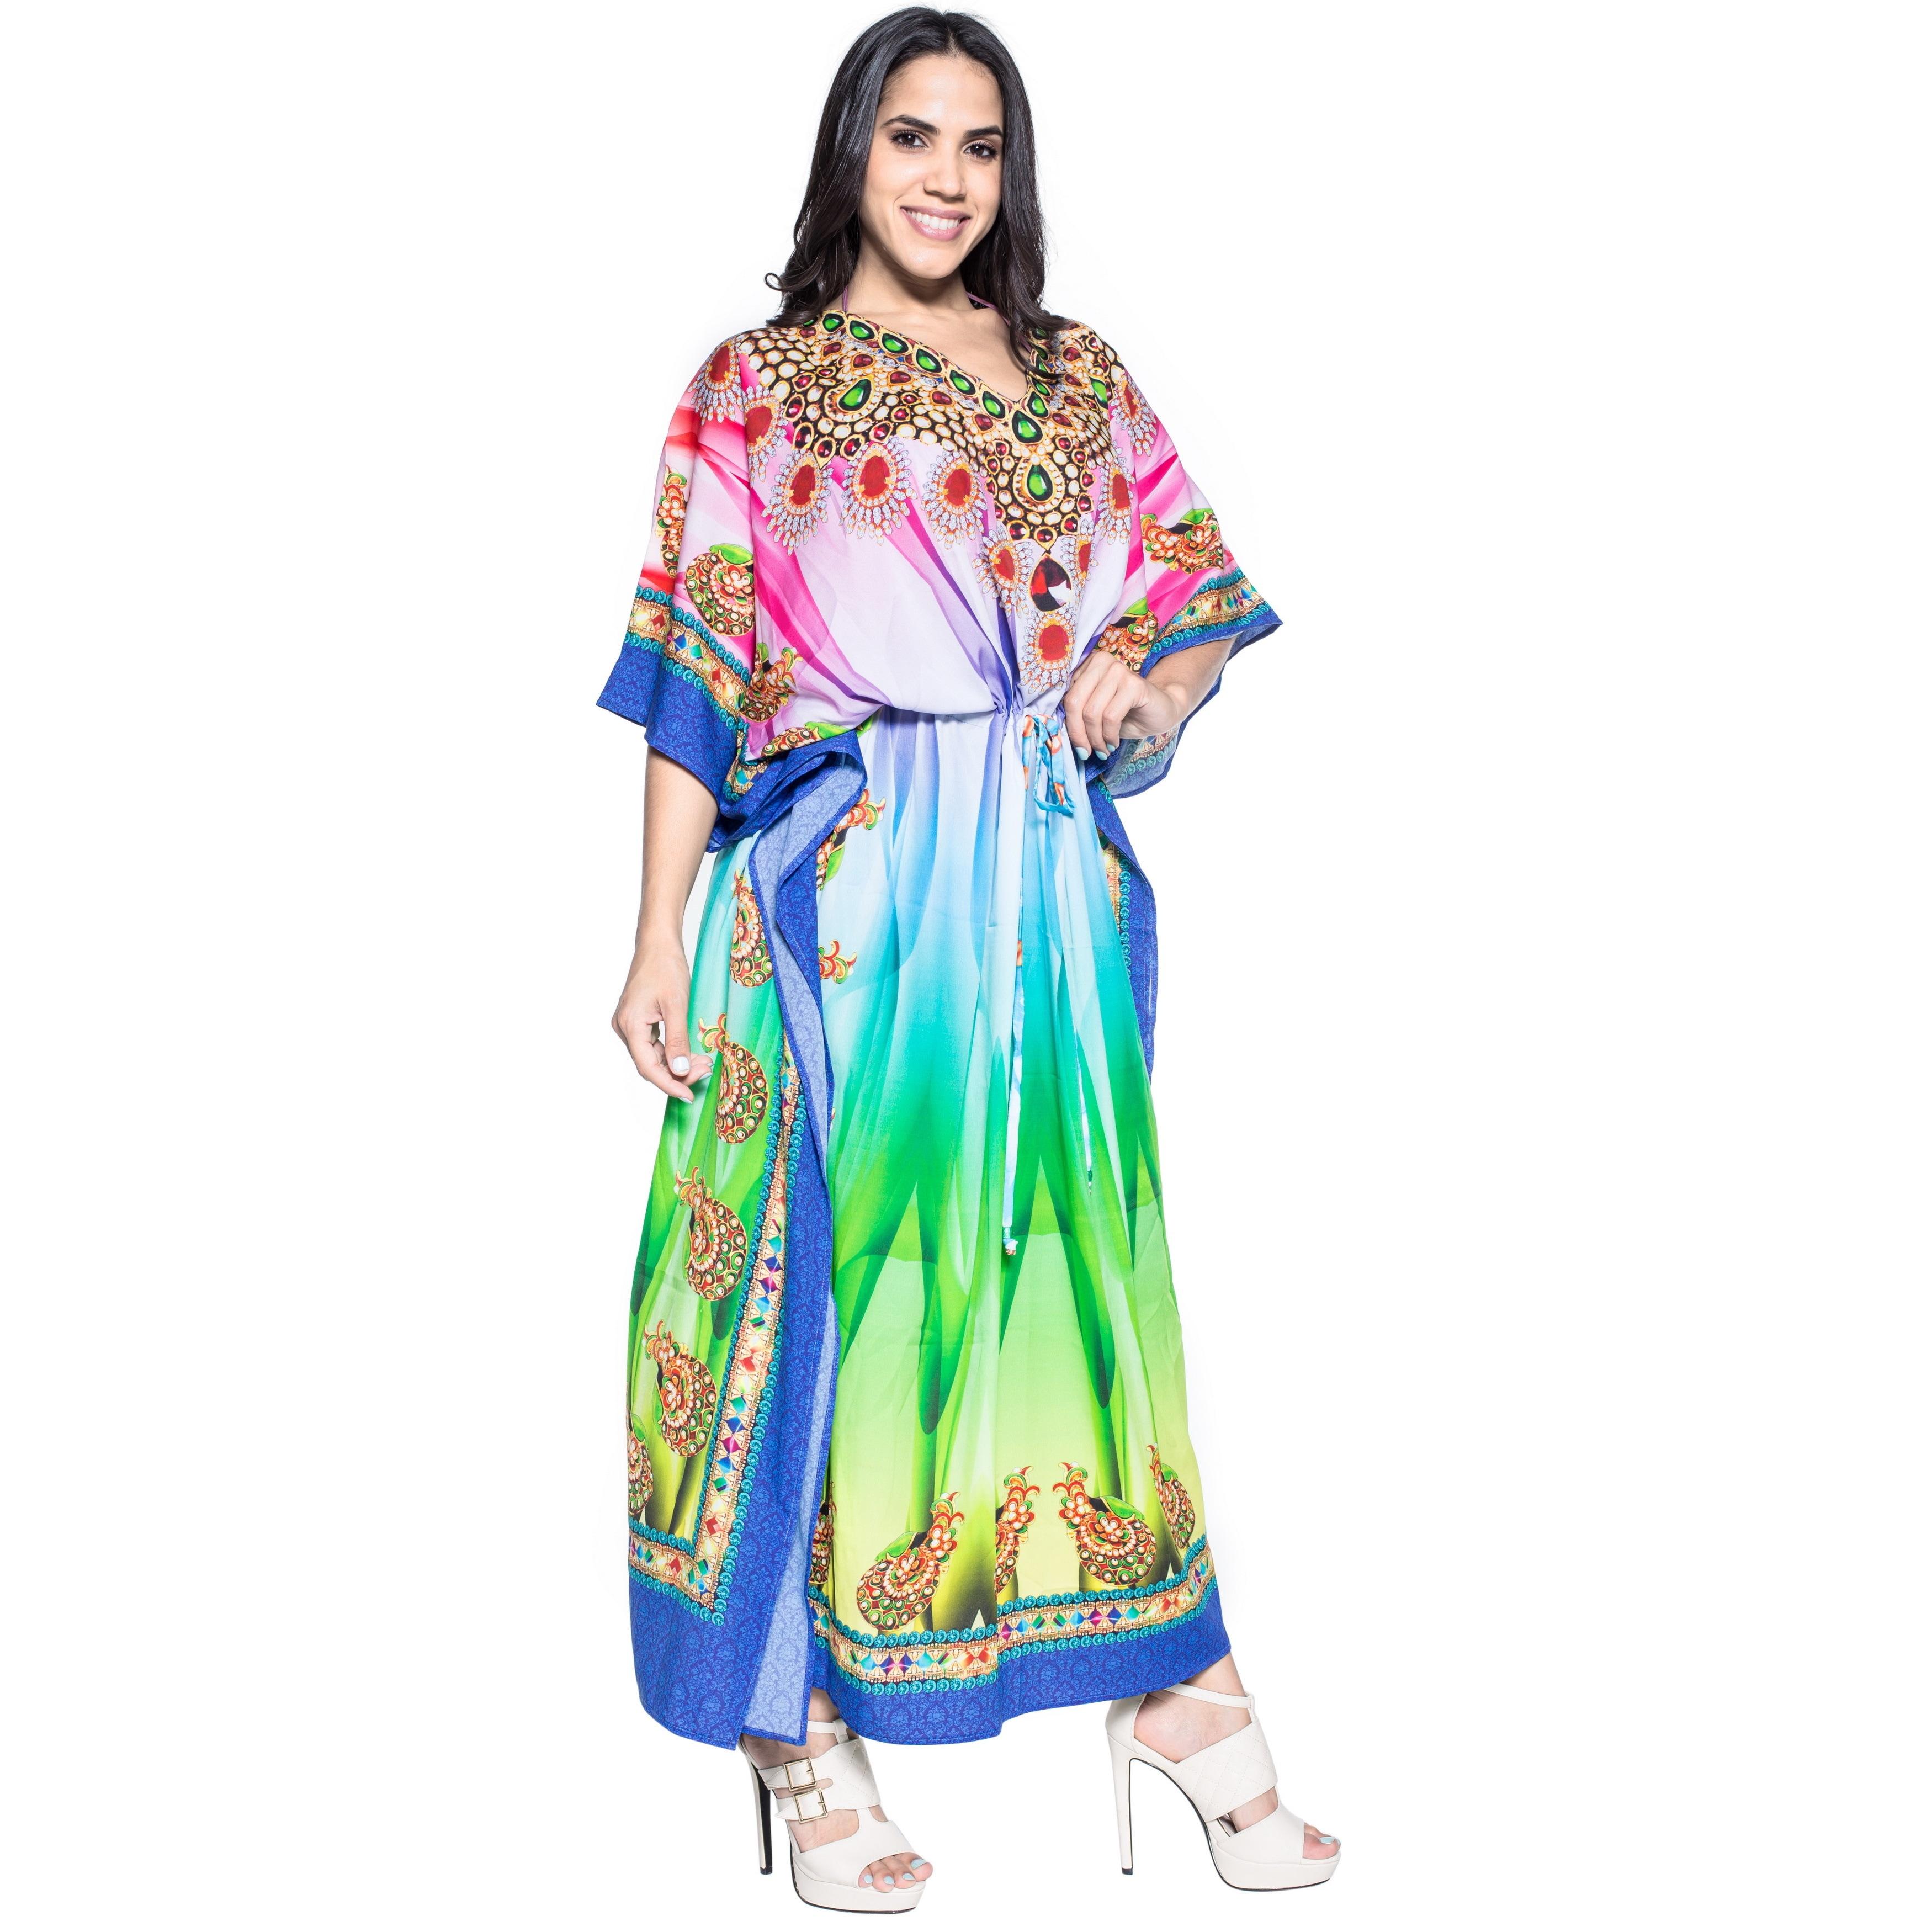 ab97cc4adbc6a Shop La Leela Soft Likre Vintage Nouveau Long Beach Evening Dress Kimono  Kaftan Green - Free Shipping On Orders Over  45 - Overstock - 12021226